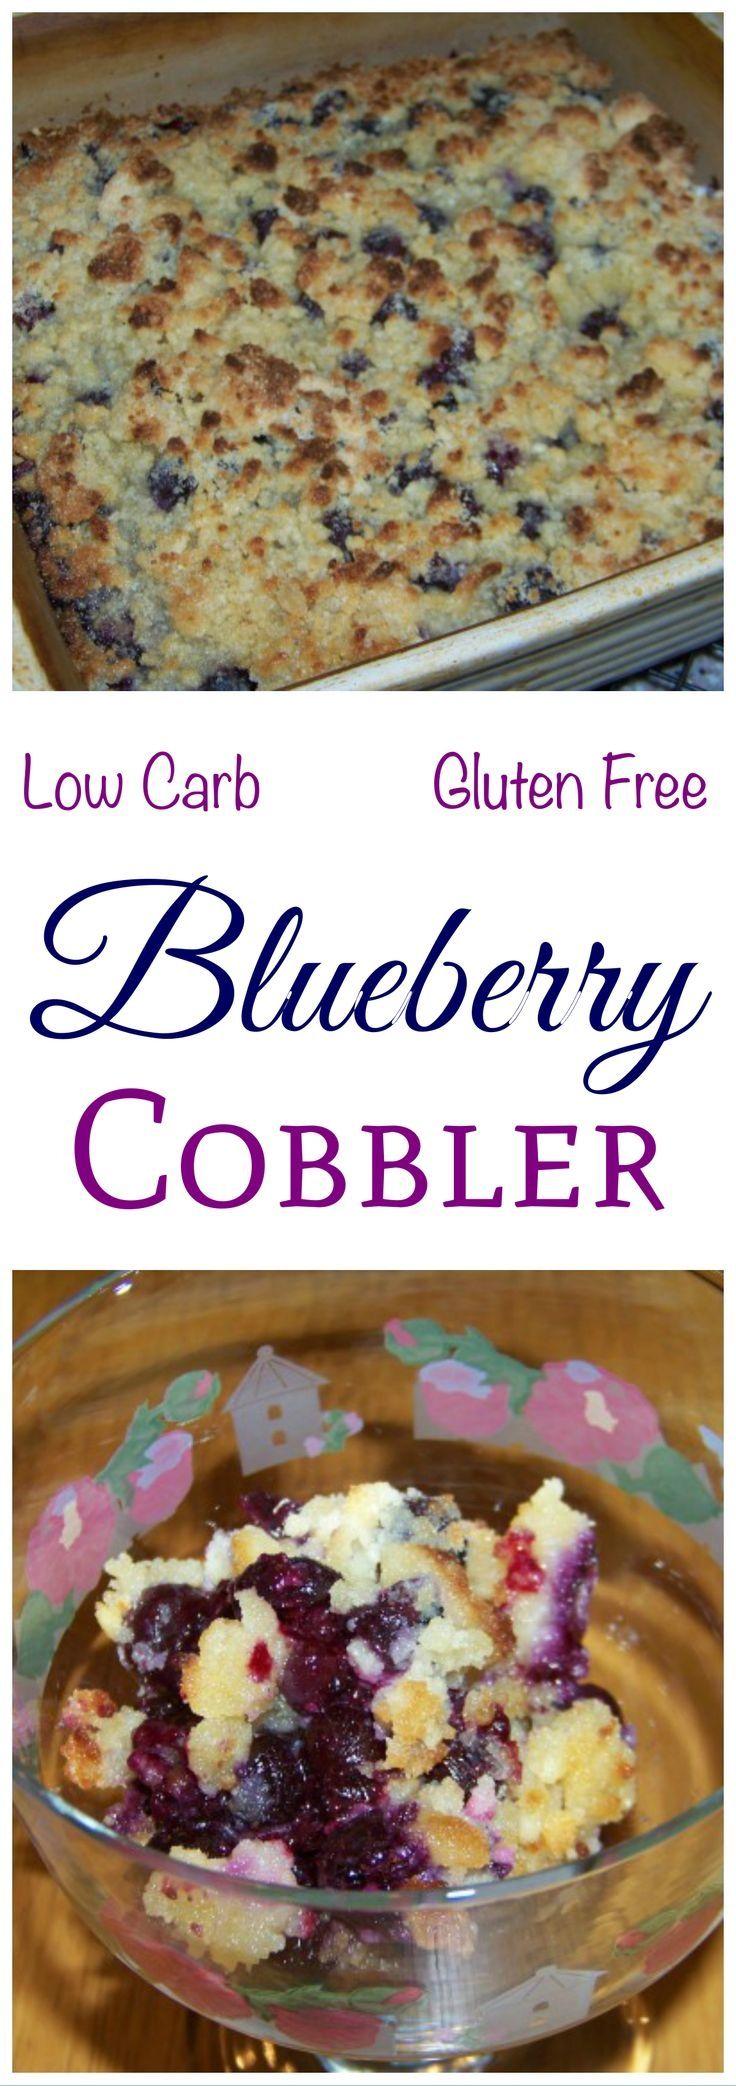 Easy Blueberry Cobbler | #Blueberry #Cobbler #Easy